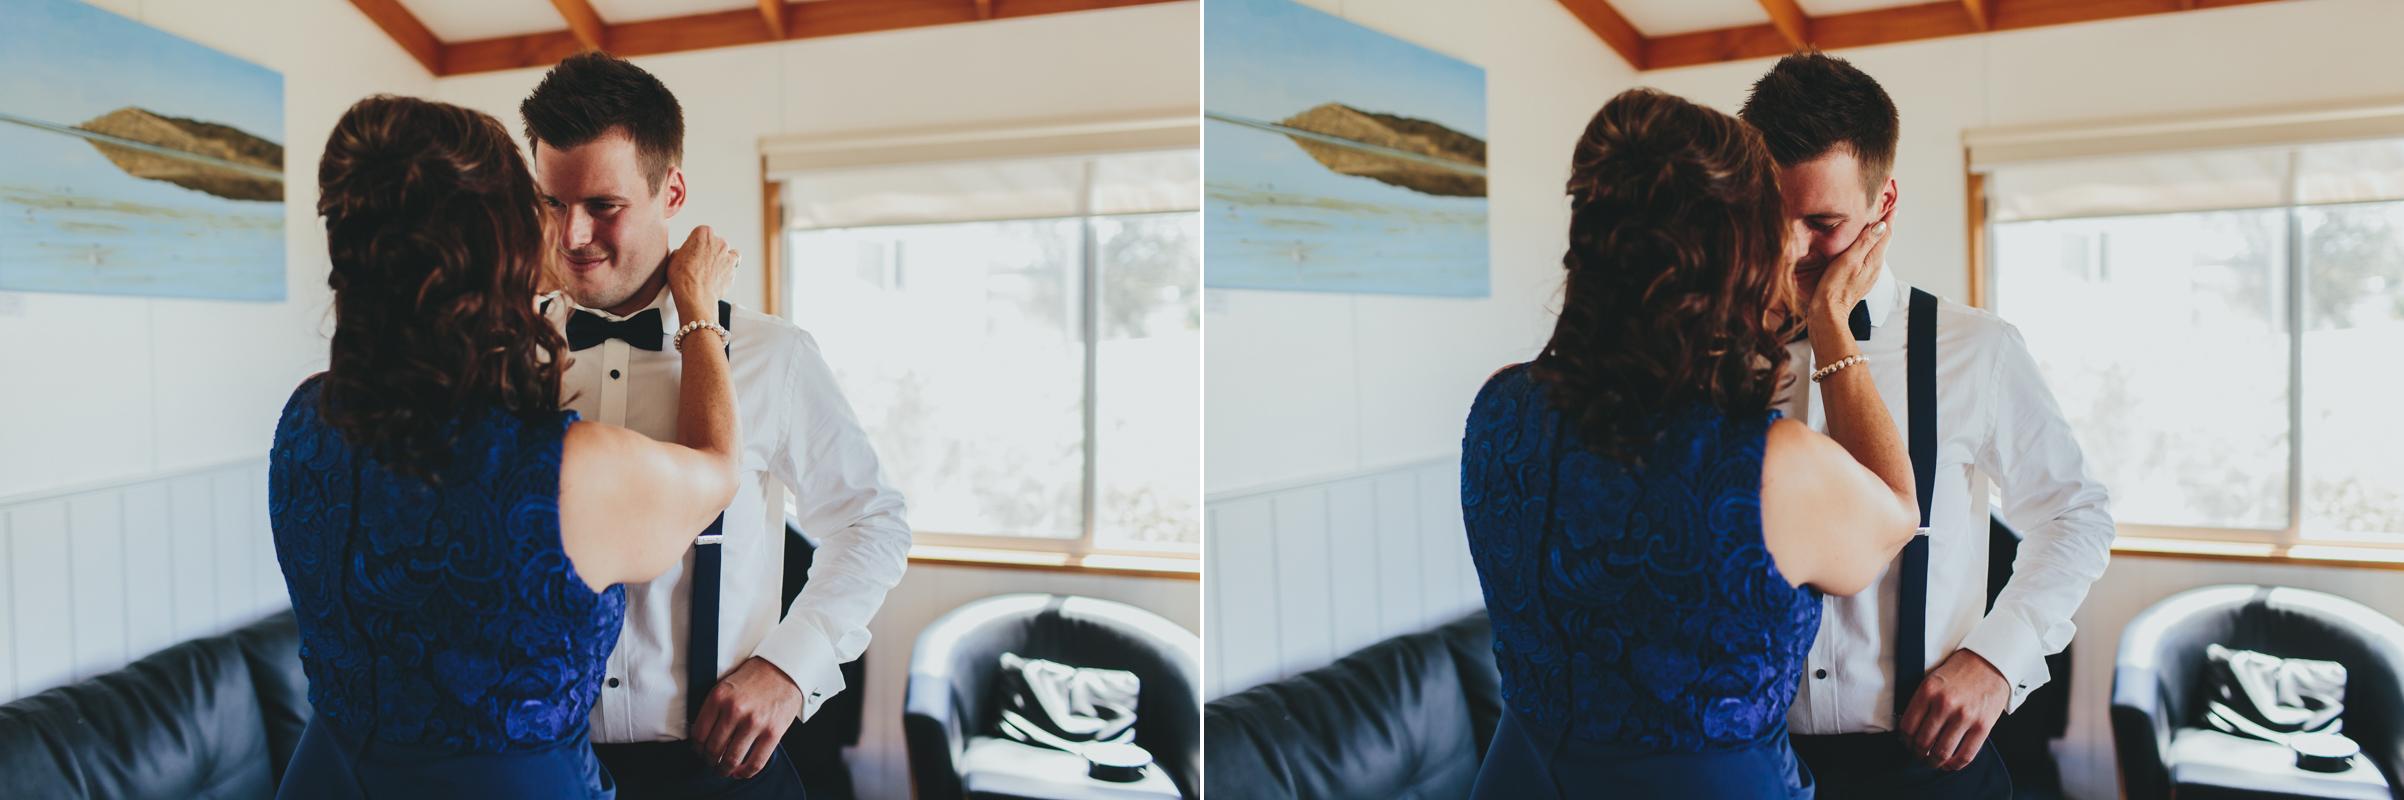 Gemma + Laynton (25 of 160) copy.jpg